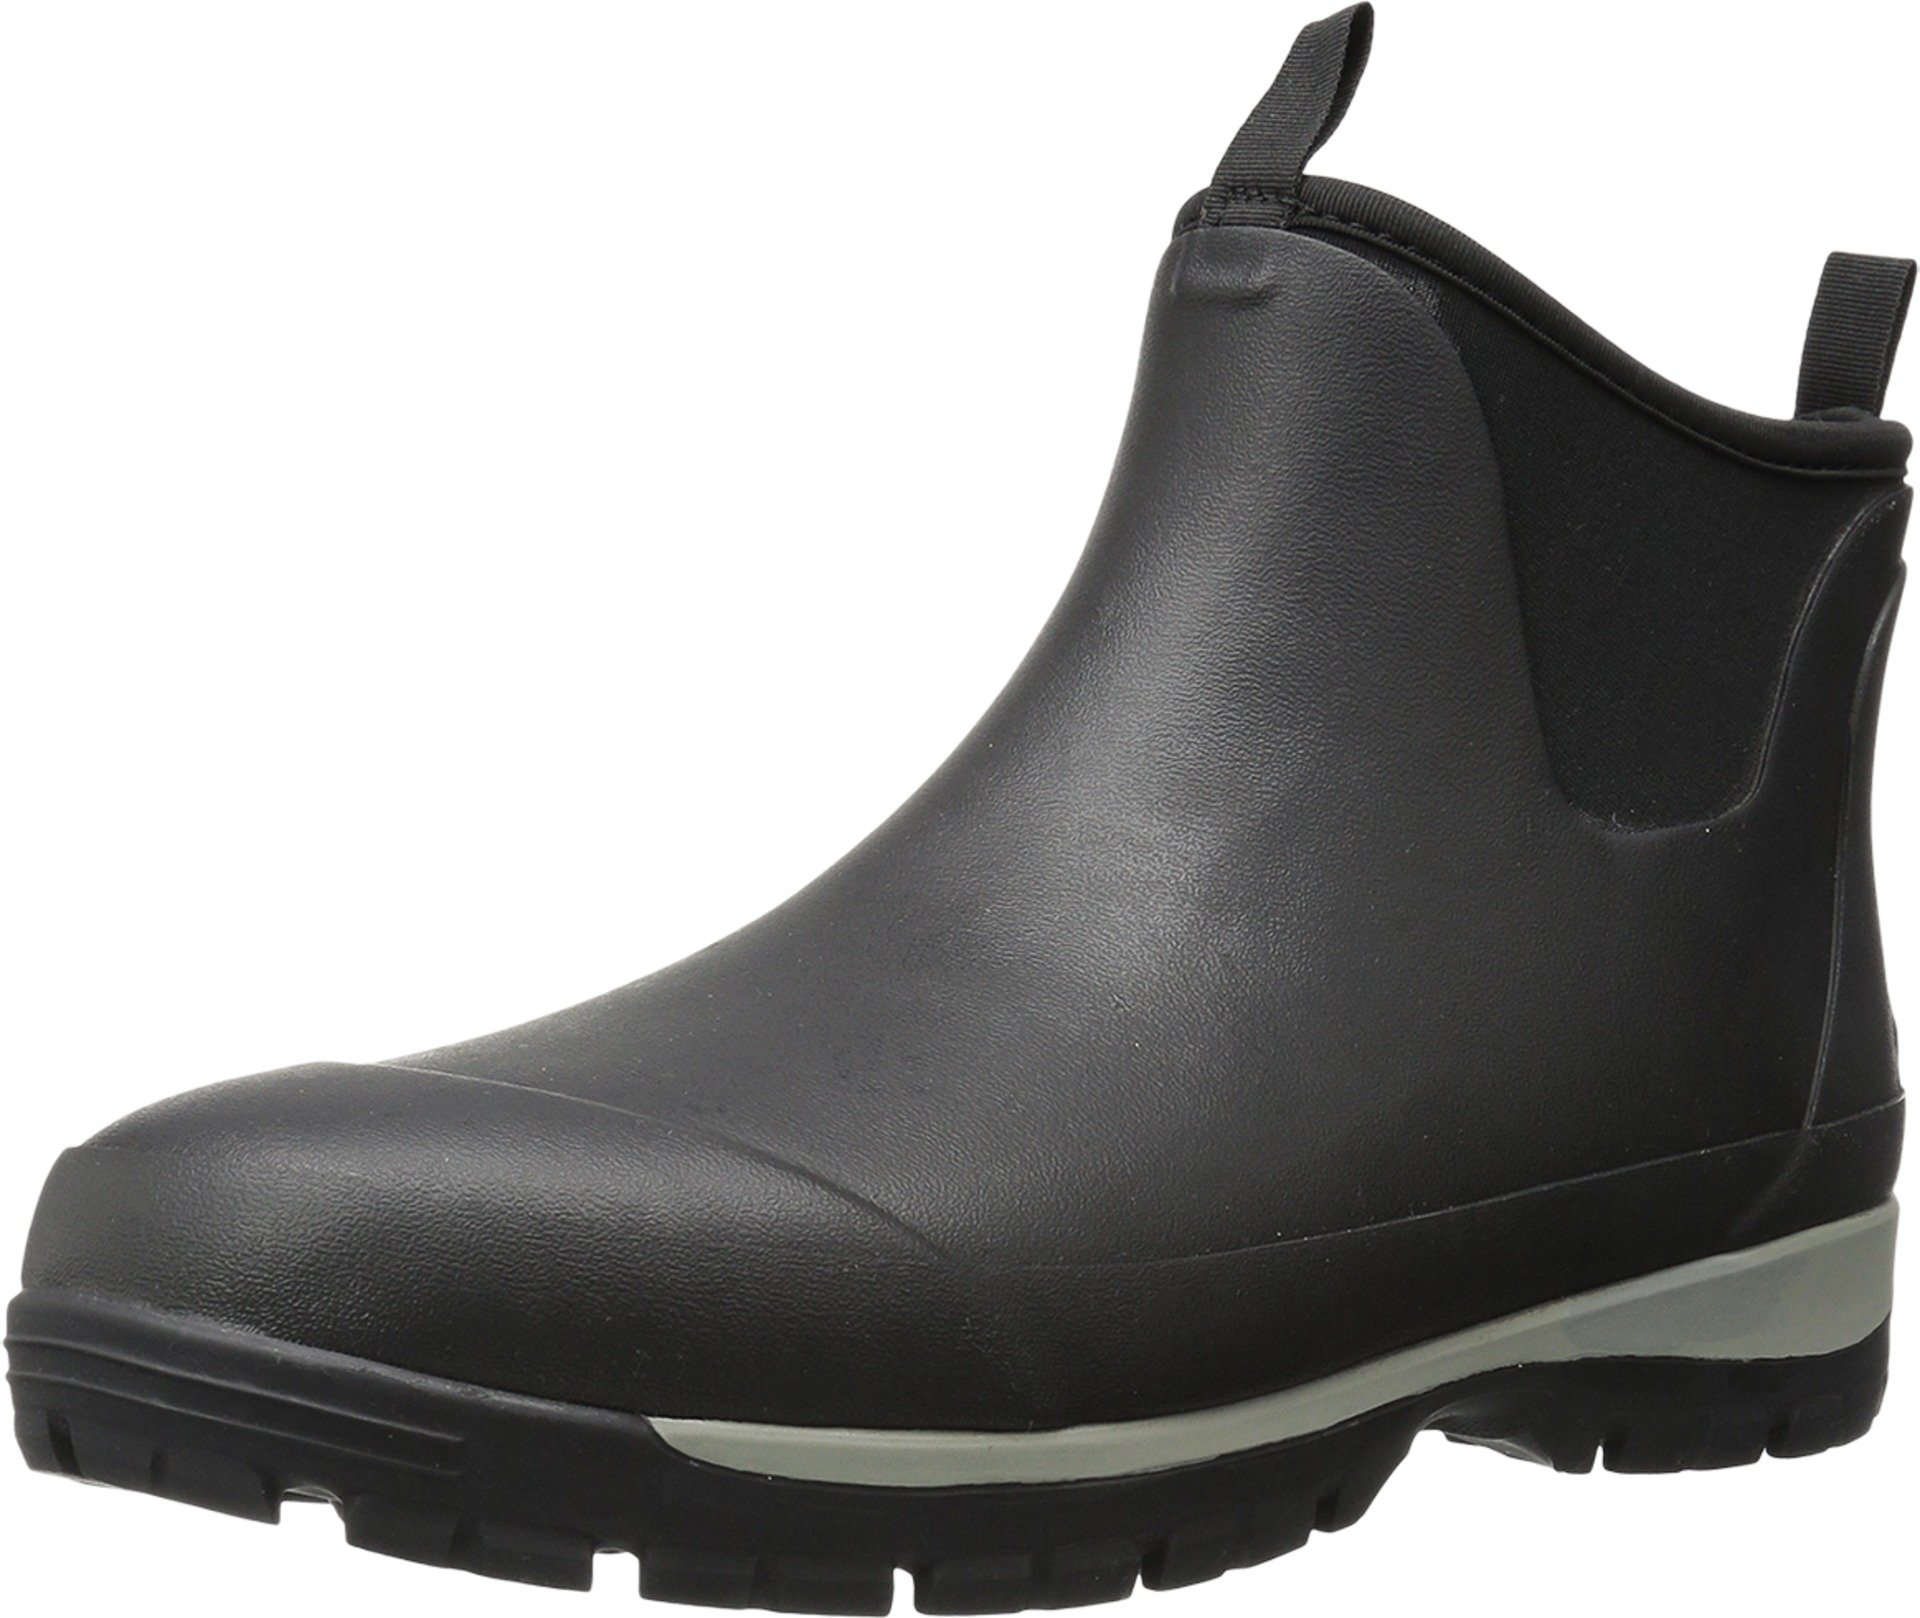 Kamik Men's LarsLO Rain Boot, Black, 10 Medium US